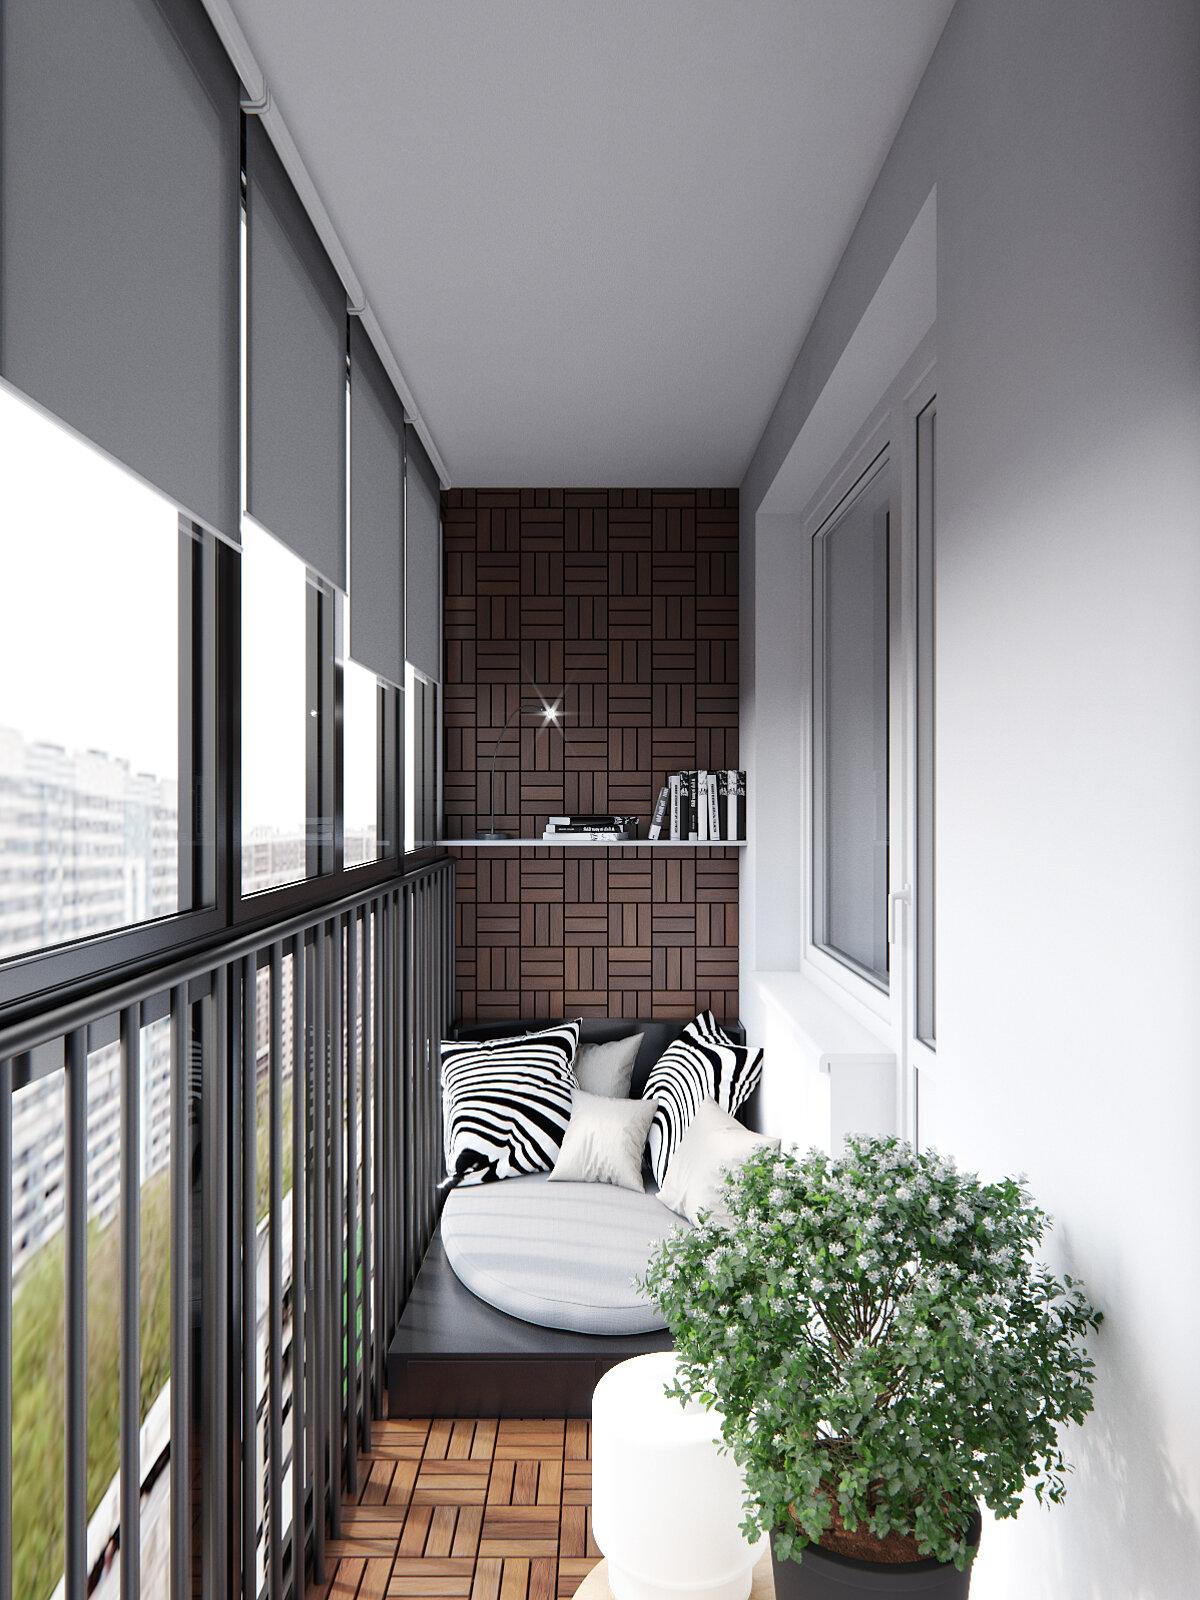 дизайн панорамного балкона фото распространение